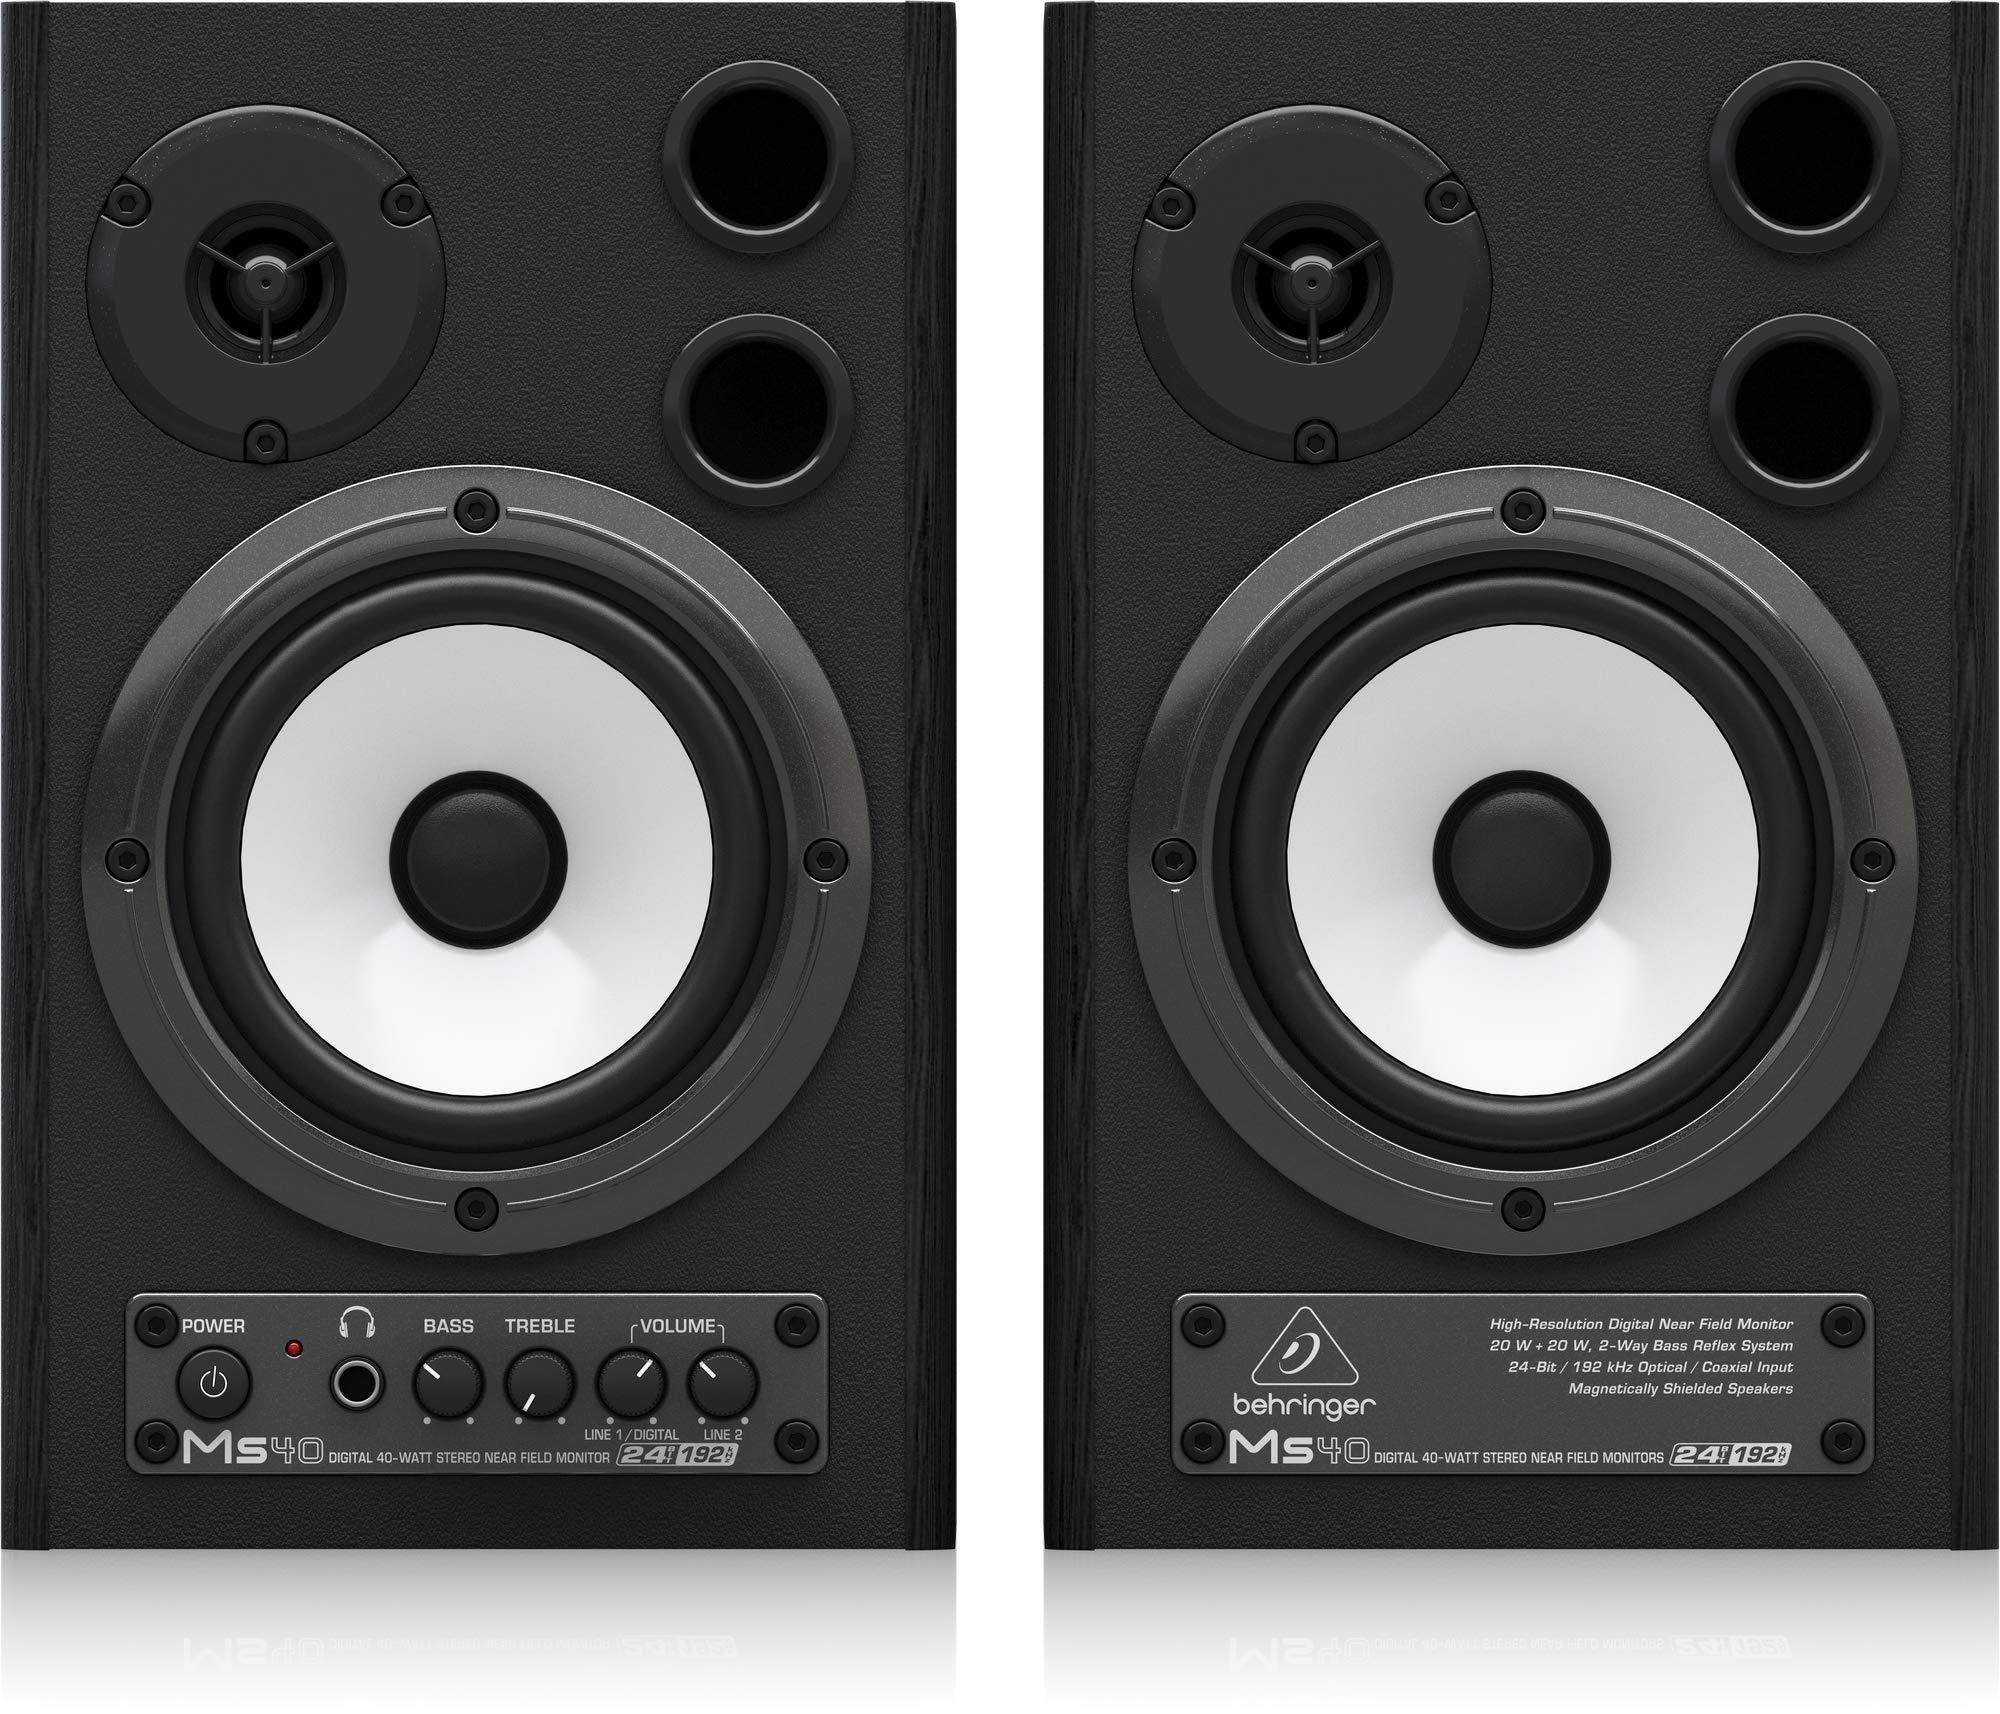 Behringer MS40 24-Bit/192 kHz Digital 40-Watt Stereo Near Field Studio Monitor Speakers